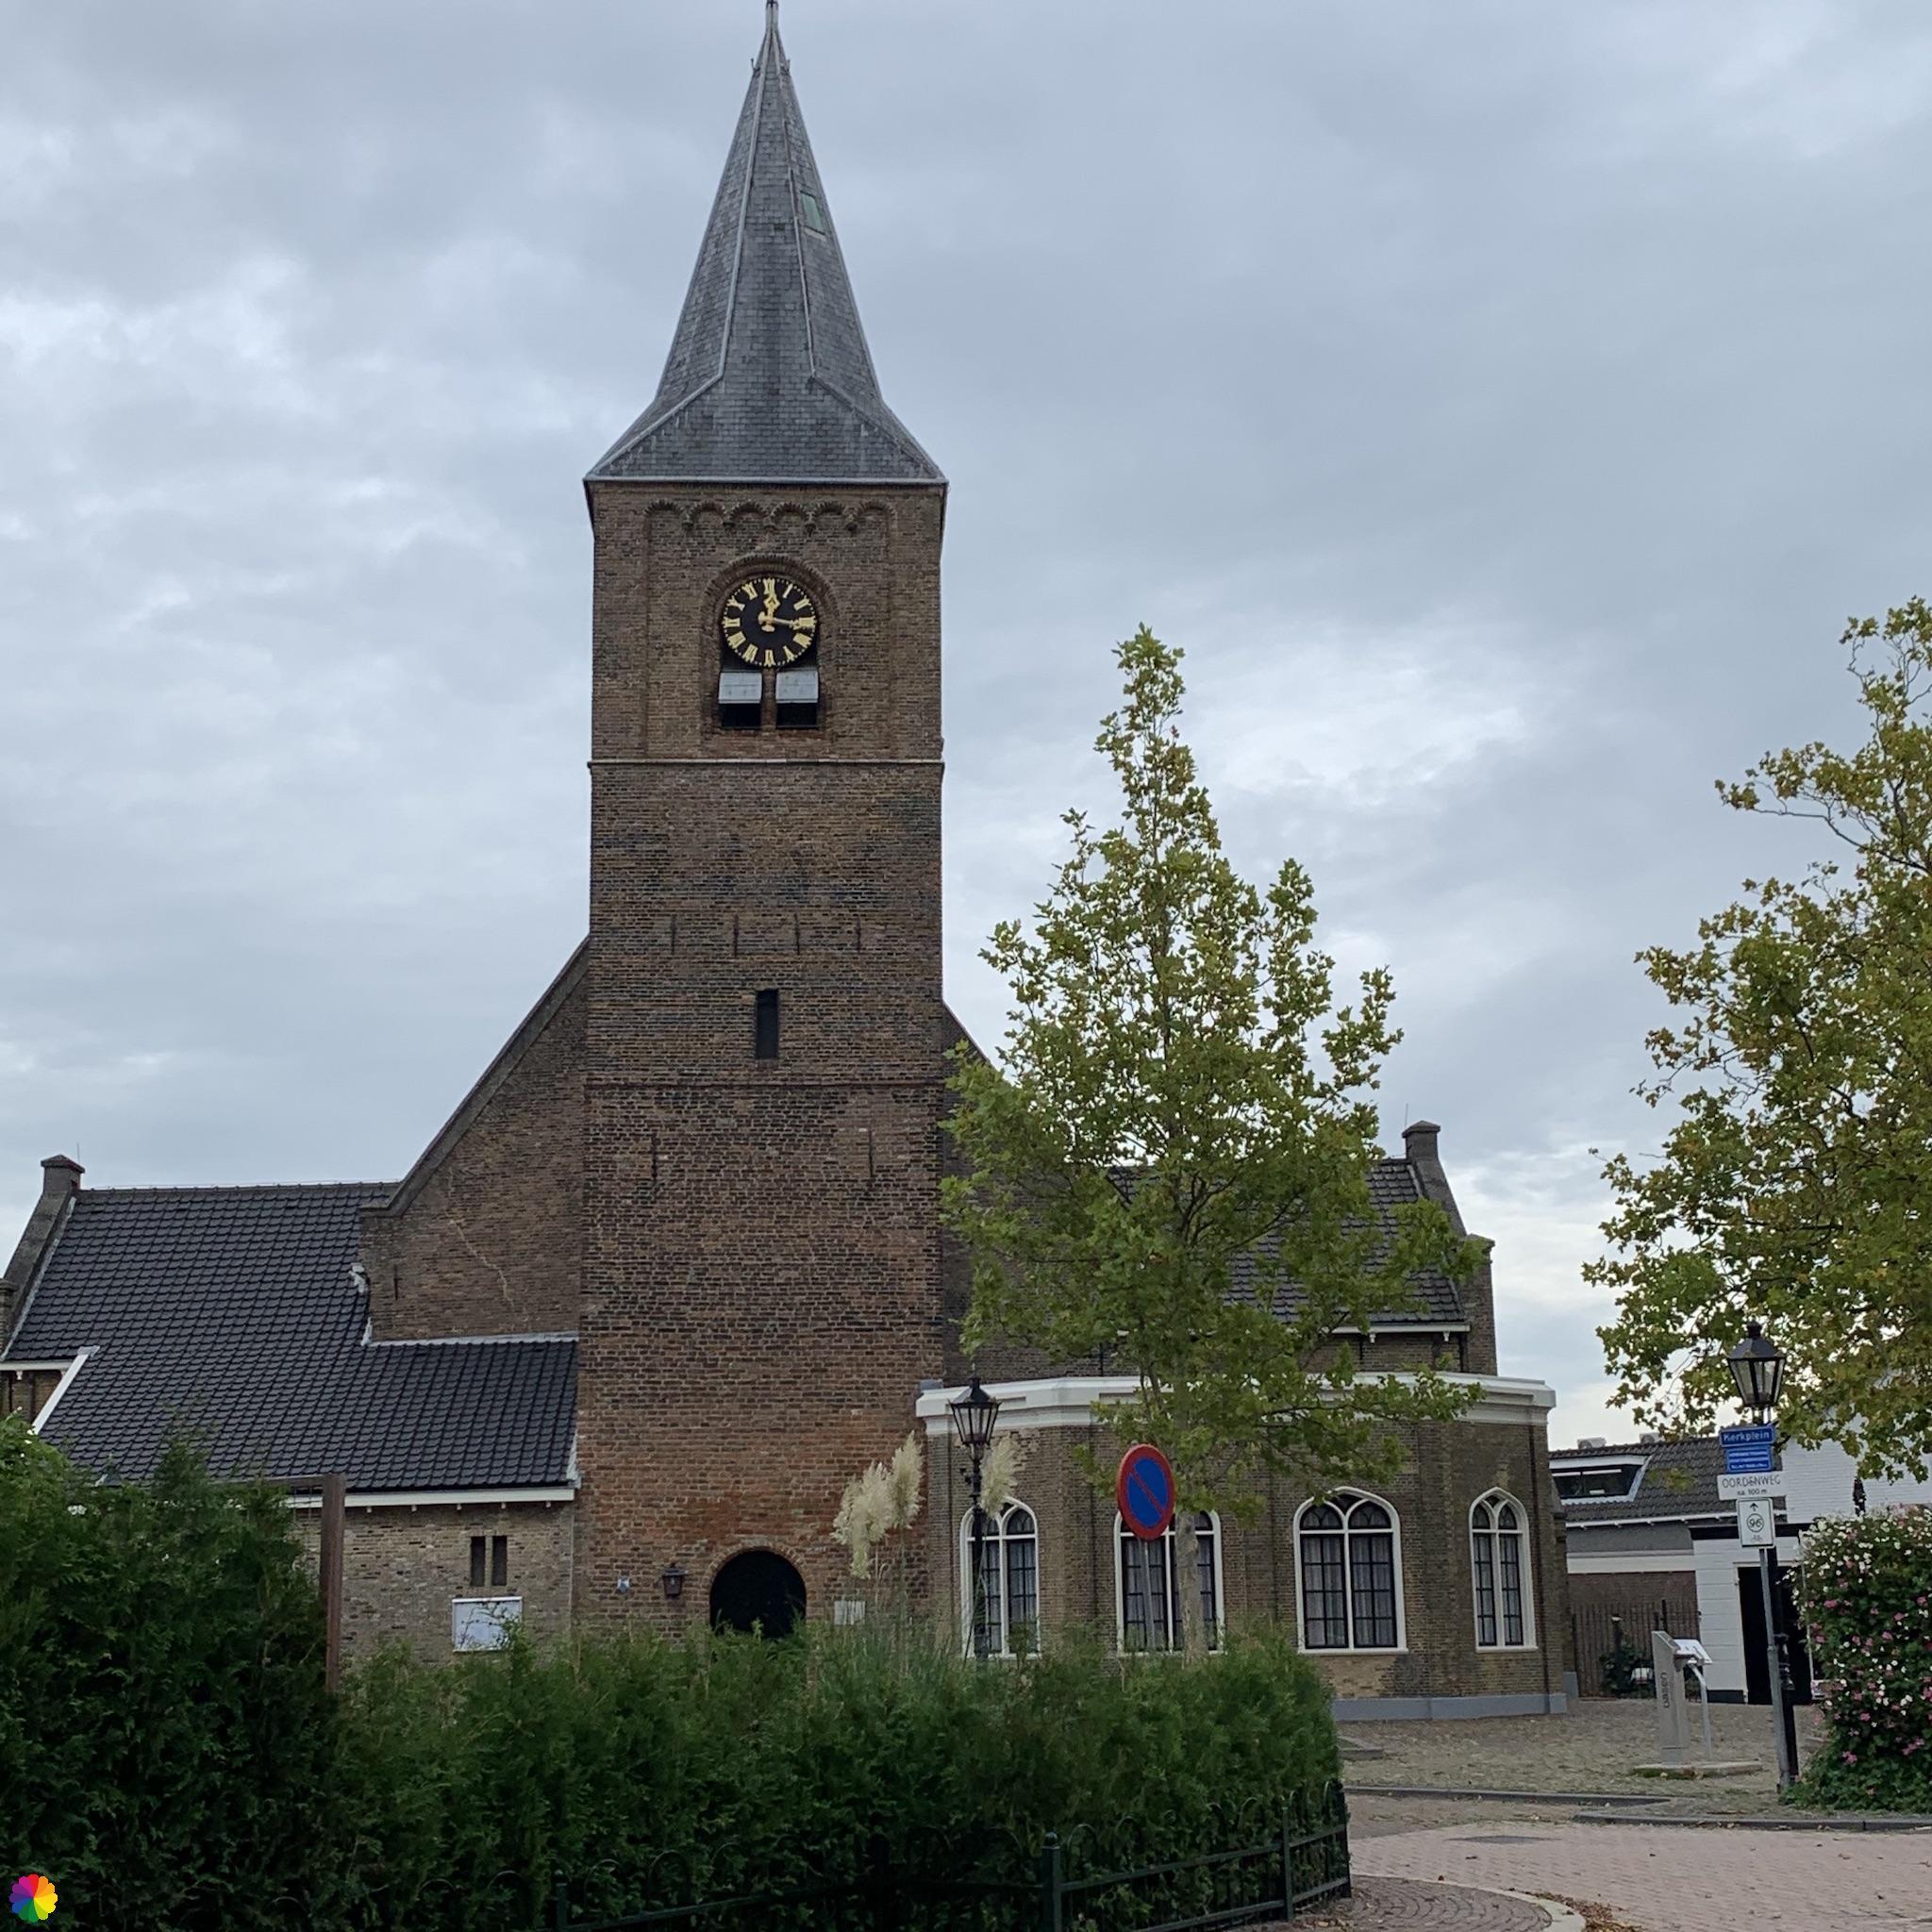 Kerk in Hendrik-Ido Ambacht